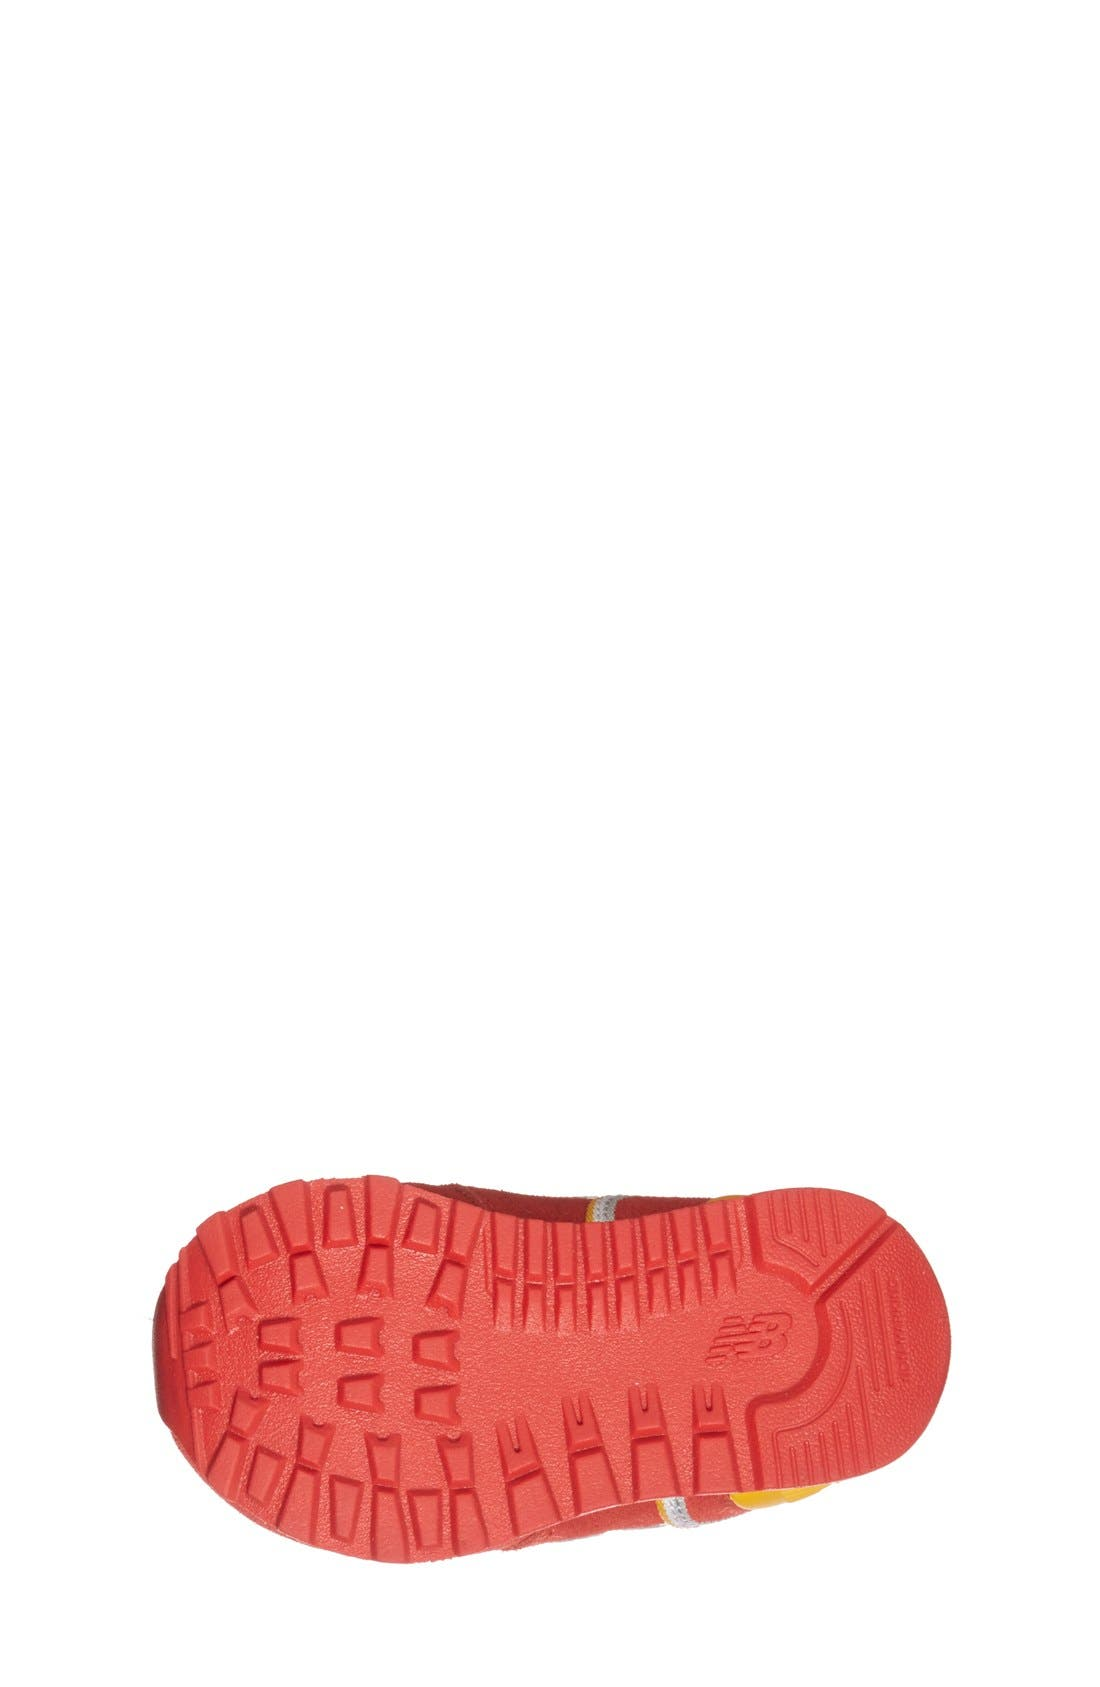 Alternate Image 2  - New Balance '574 - Stadium' Sneaker (Baby, Walker & Toddler)